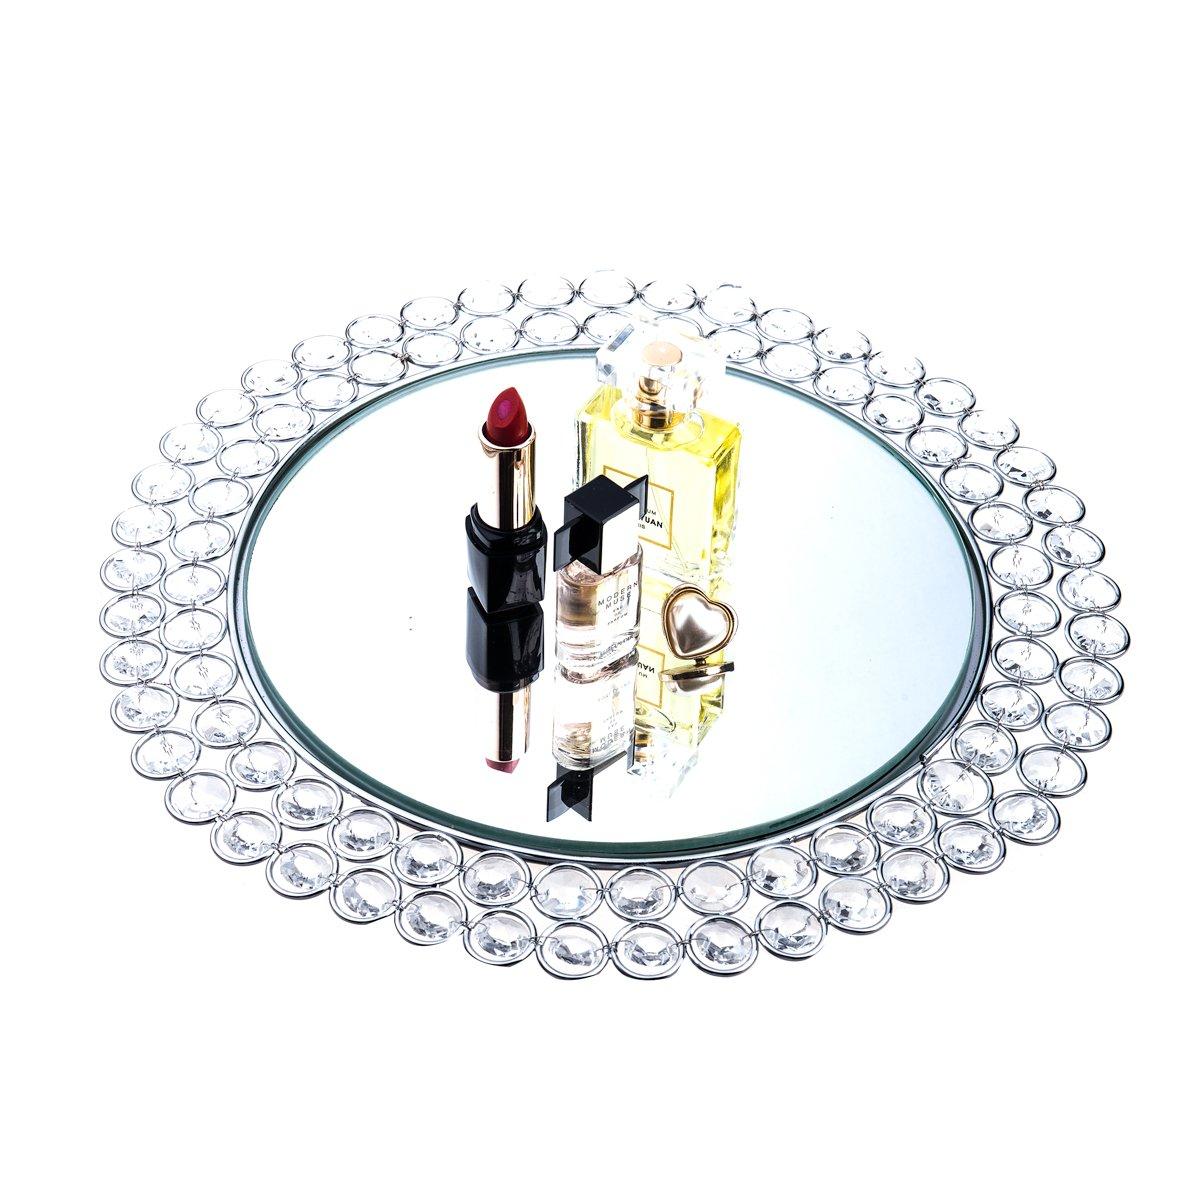 Feyarl Crystal Mirrored Jewelry Tray Cosmetic Organizer Vanity Tray Decorative Tray (Silver)